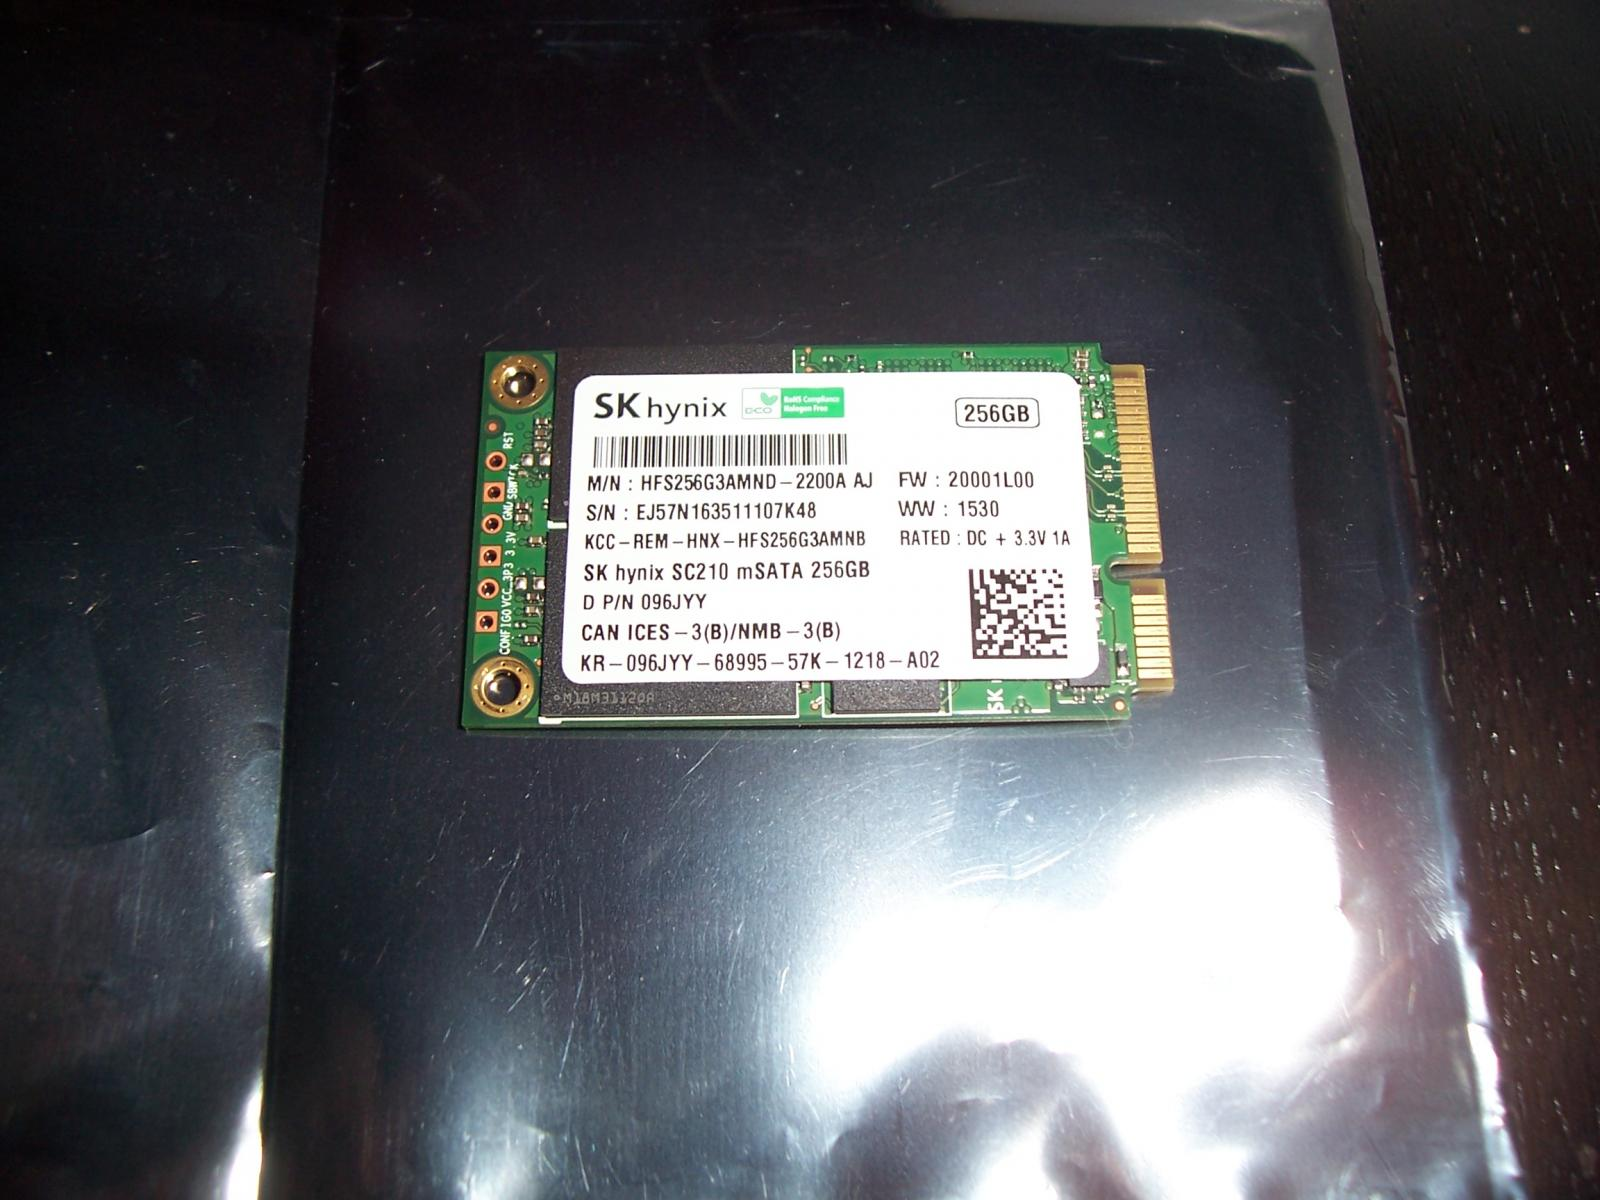 Photo of 256GB Hynix SC210 mSATA SSD